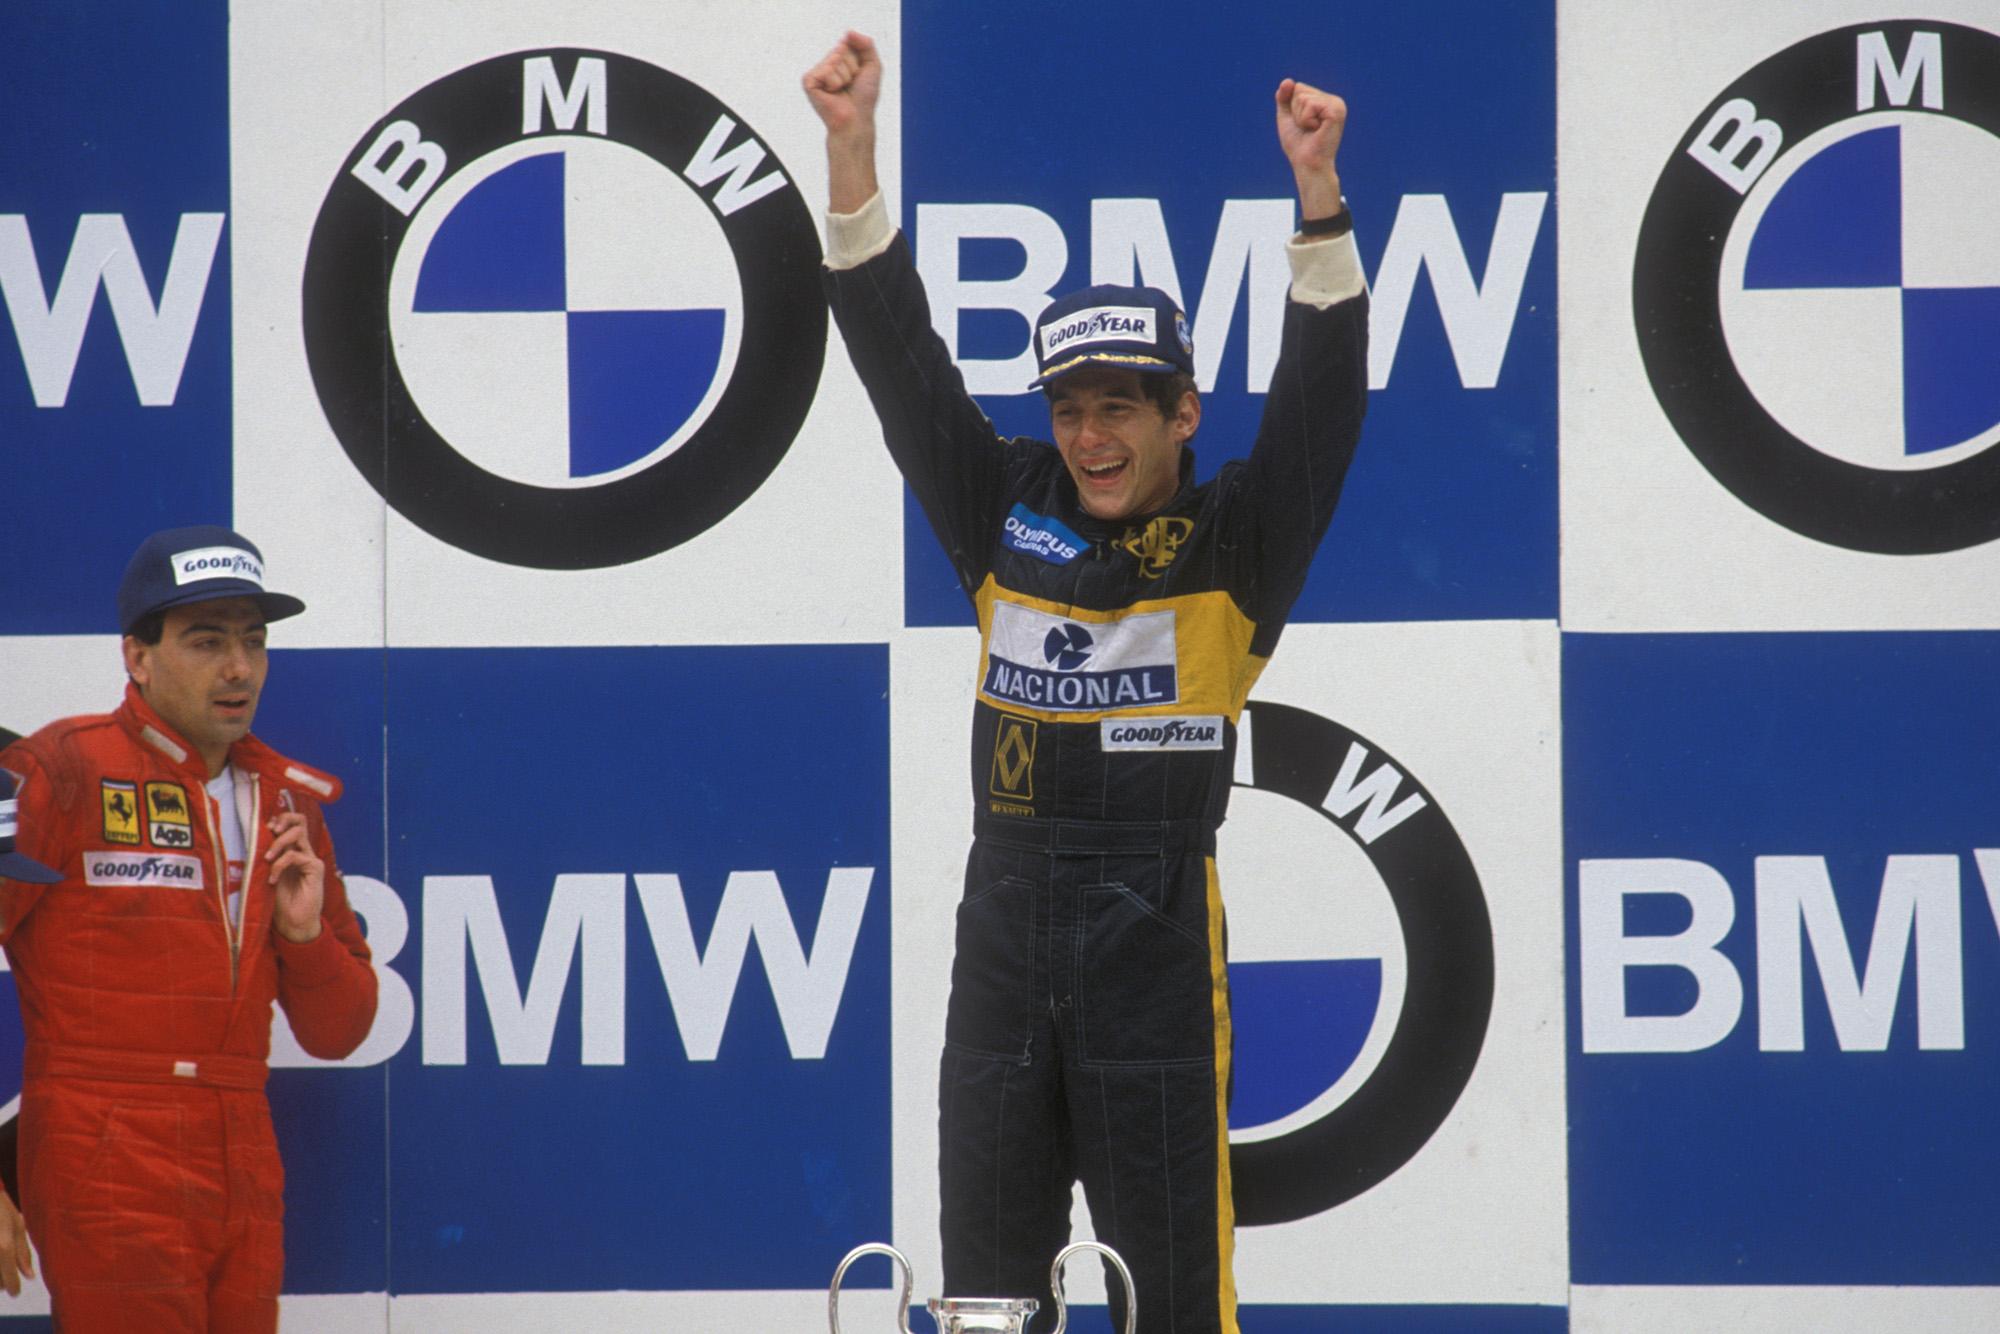 Ayrton Senna celebrates his first Formula 1 victory in the 1985 Portuguese Grand Prix